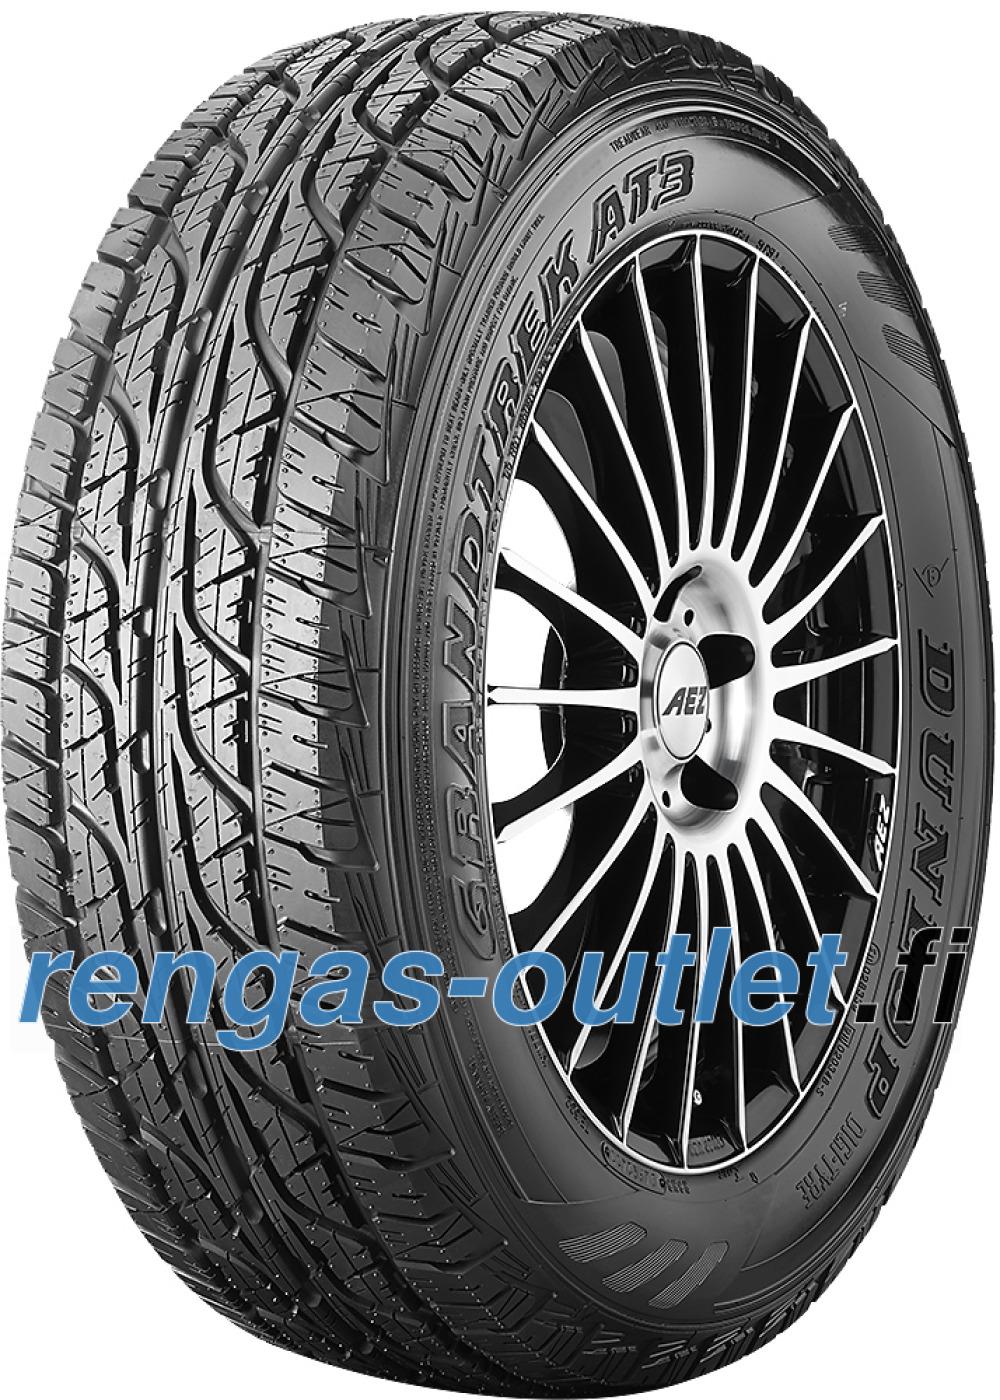 Dunlop Grandtrek AT 3 ( 255/65 R16 109H )